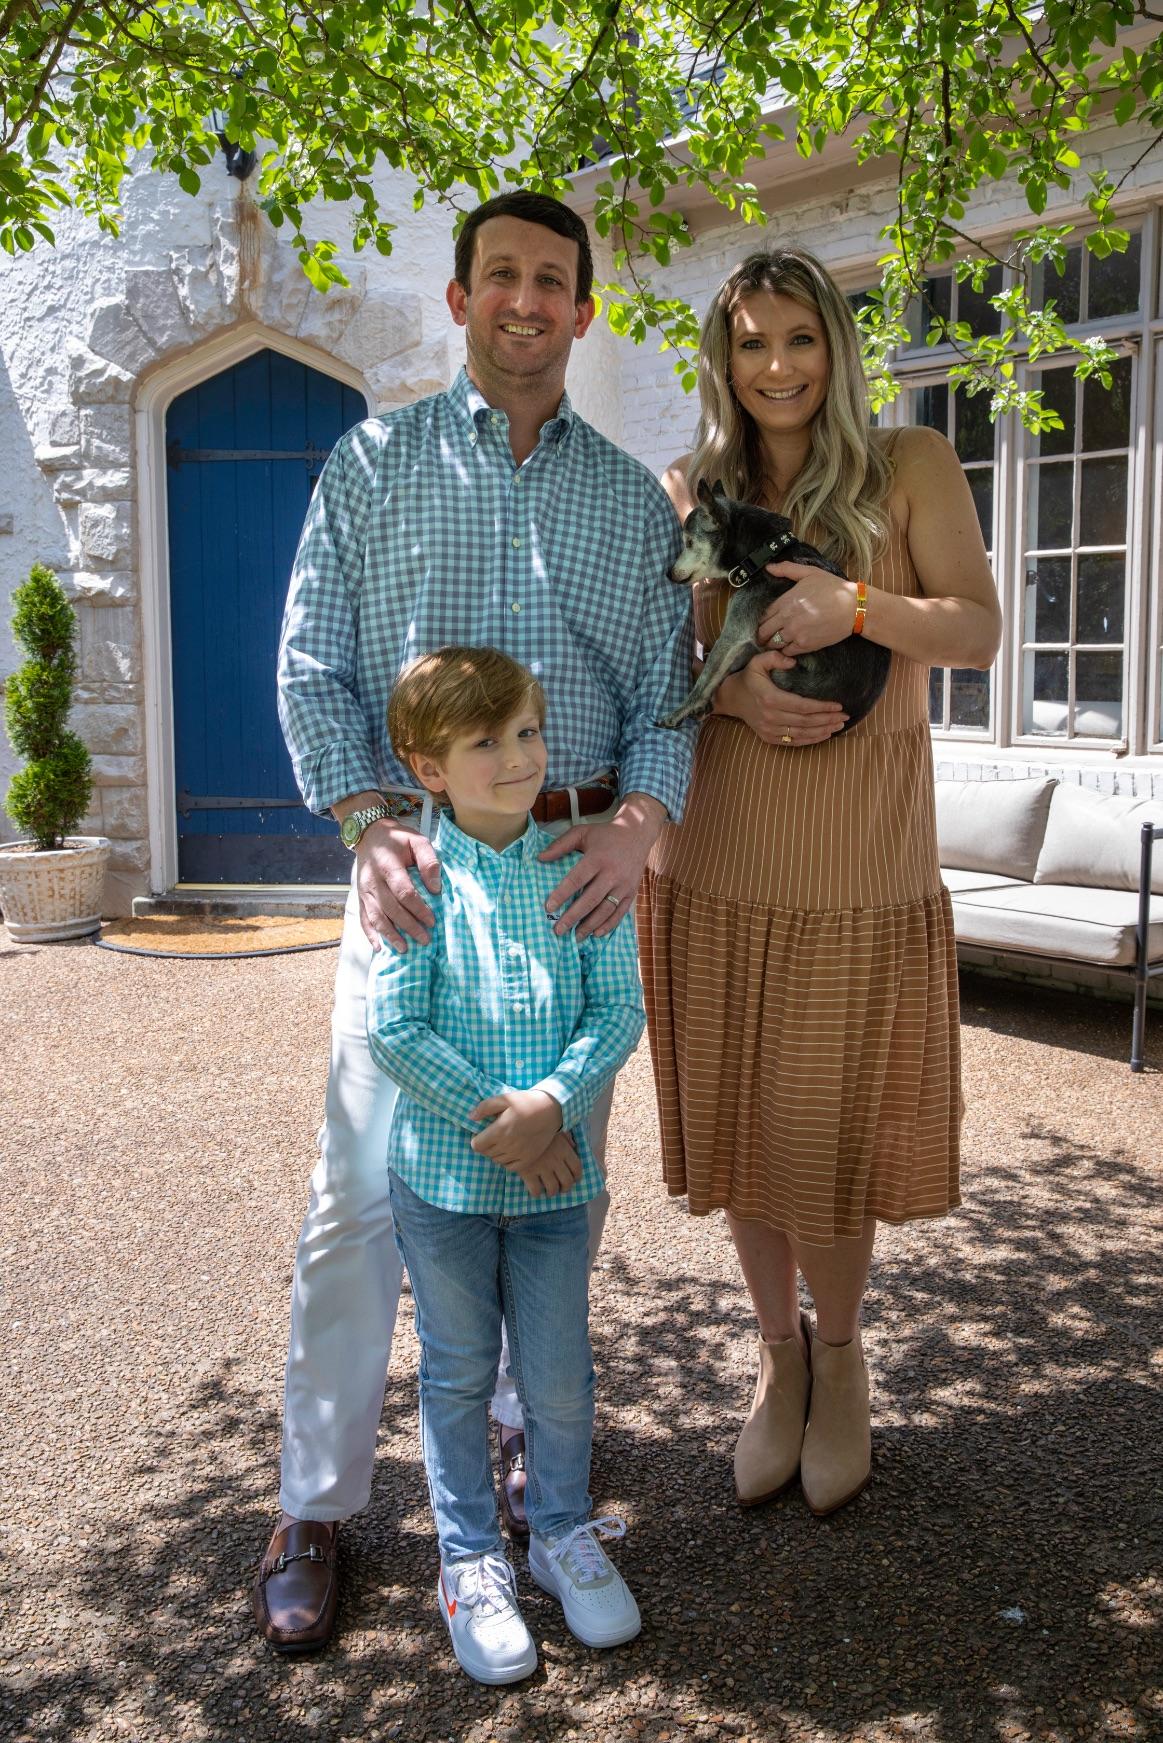 Jeremy Jeter, Real Estate Advisor, and family